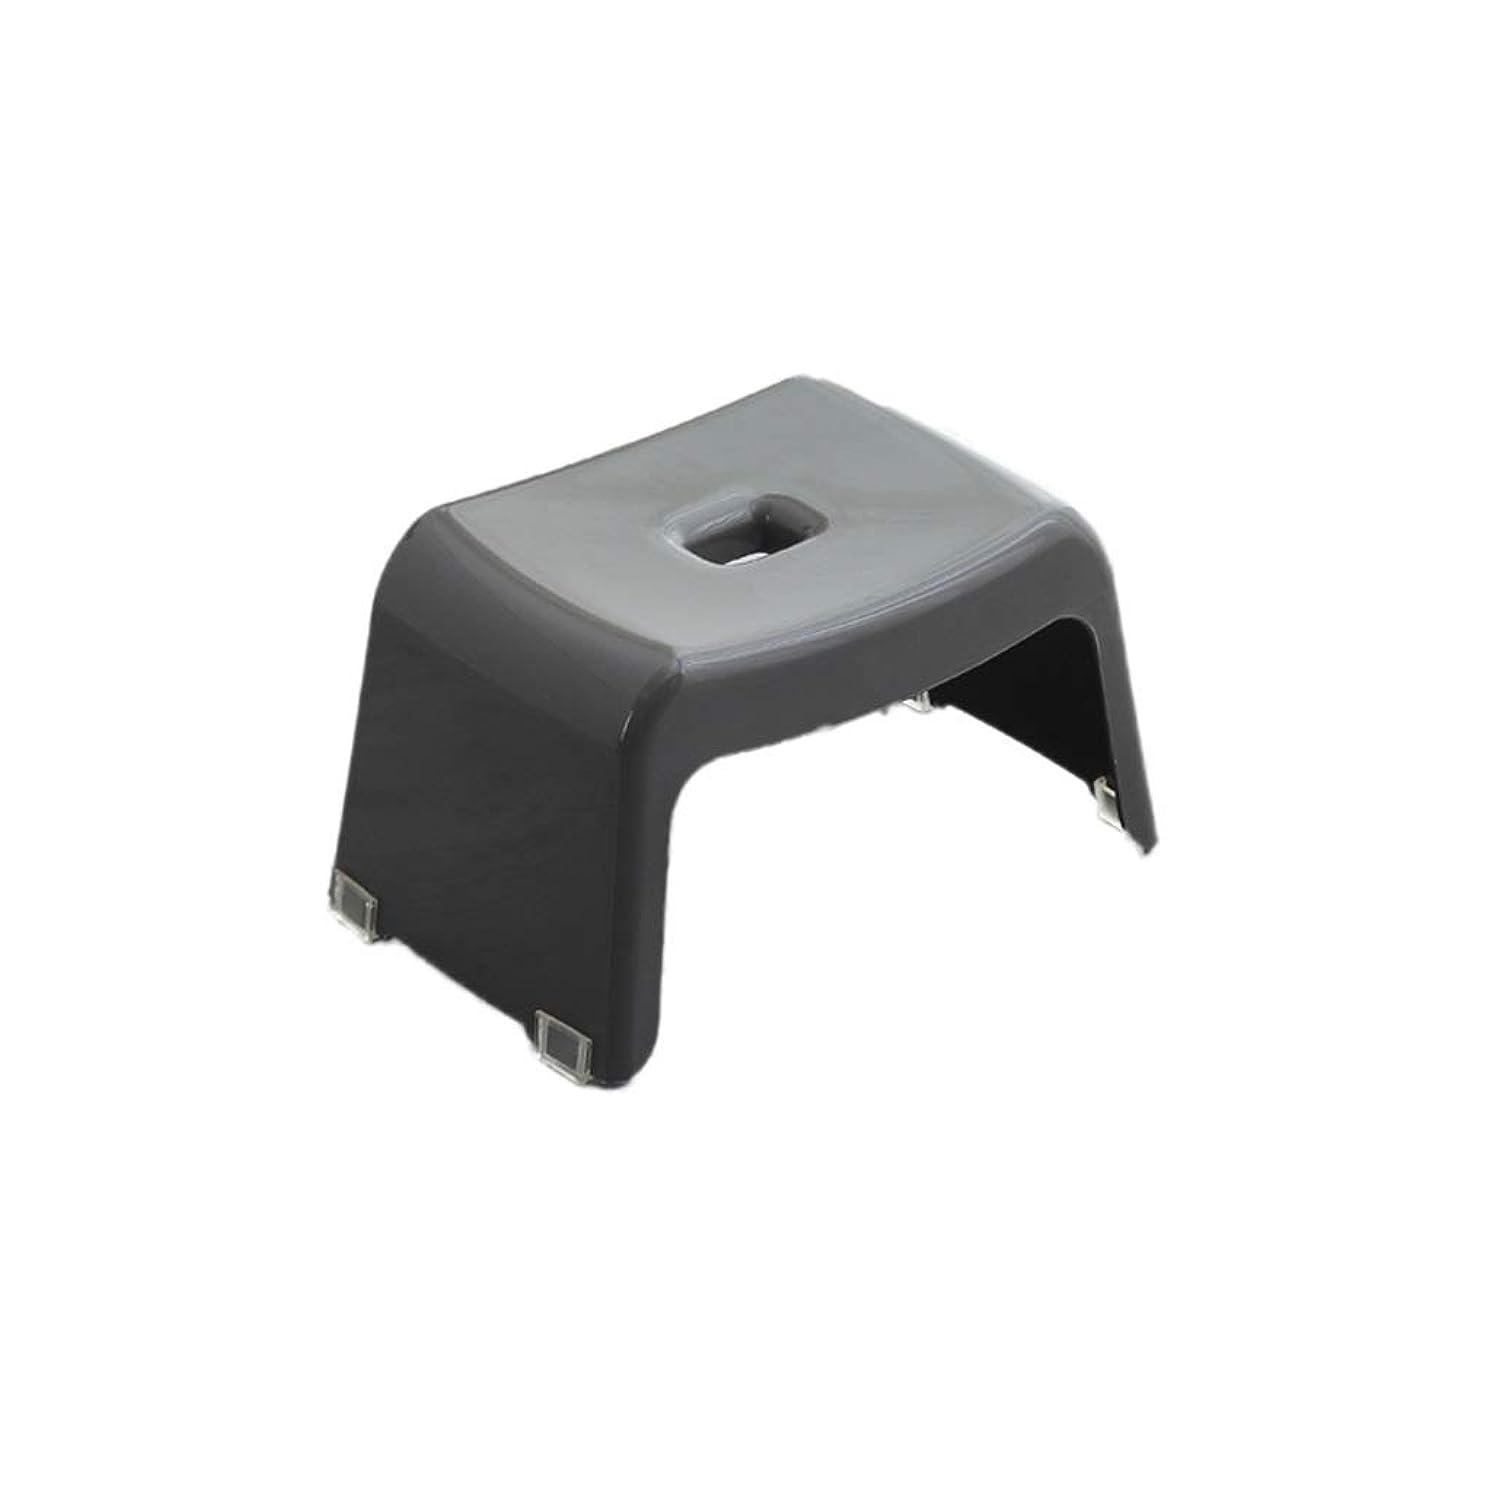 Bath Stool, Plastic Sturdy Shower Stool Home Plastic Stack Stool Kitchen Stool Change Shoe Bench Children's Stool (Color : Gray, Size : 19CM)